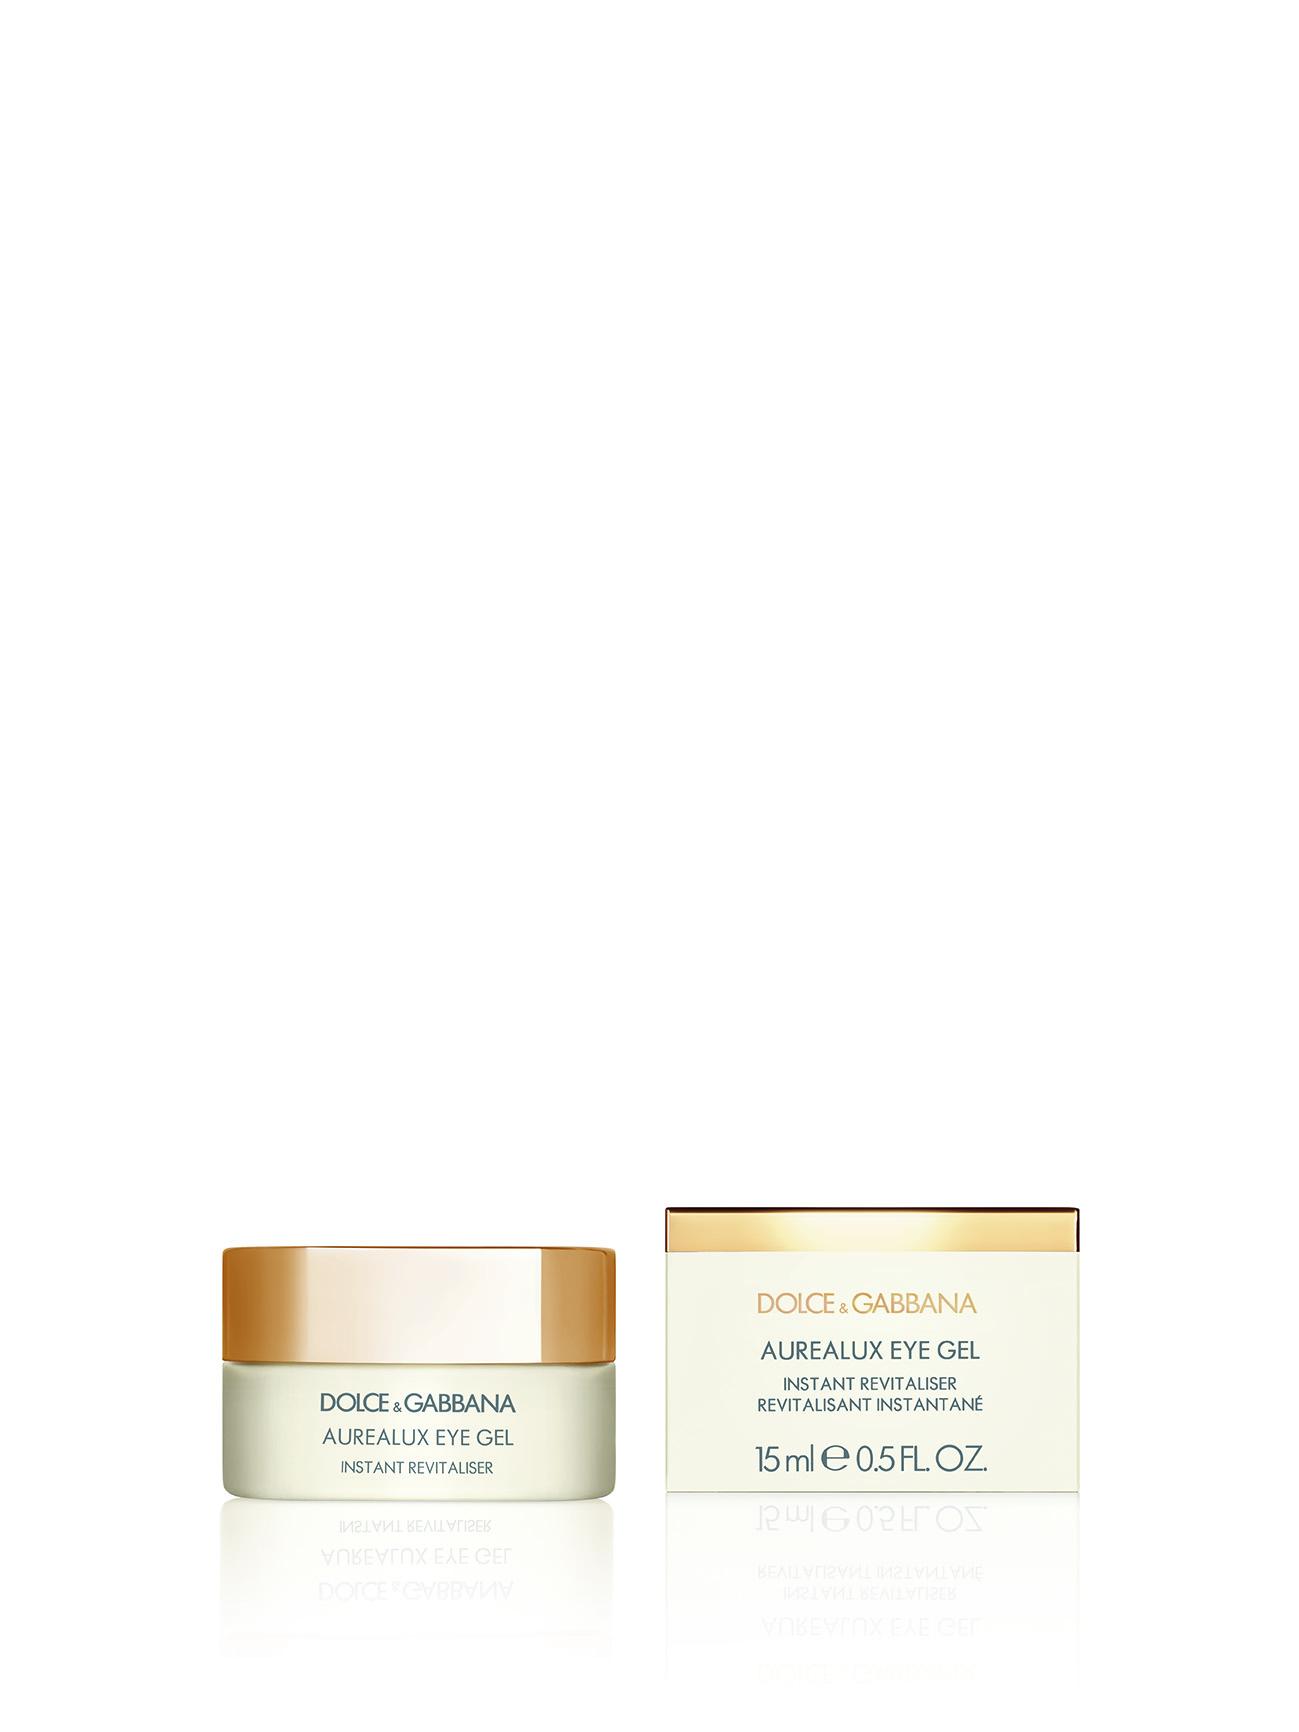 Dolce & Gabbana Skincare Aurealux Eye Gel (15 ml, PVPR 54,50 €)